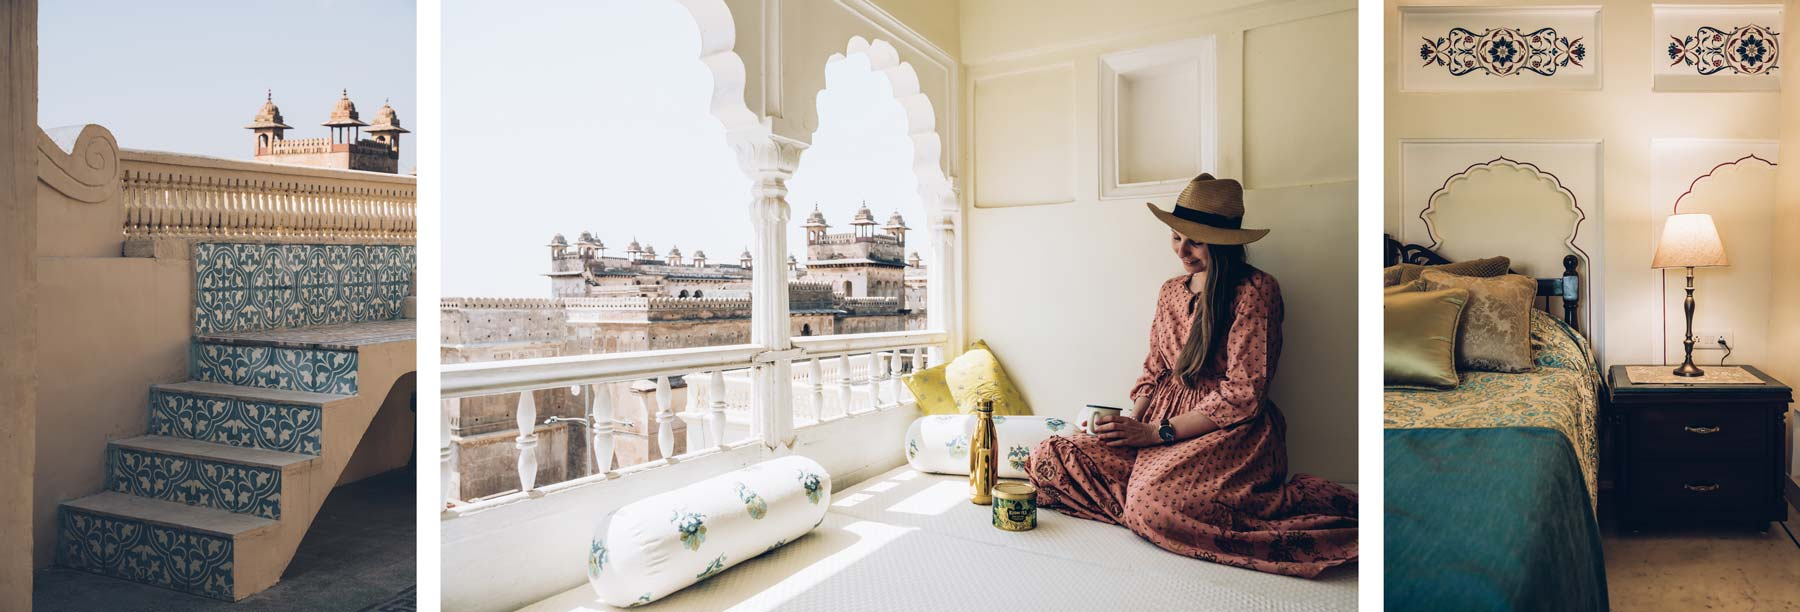 Hotel Orchha, Inde